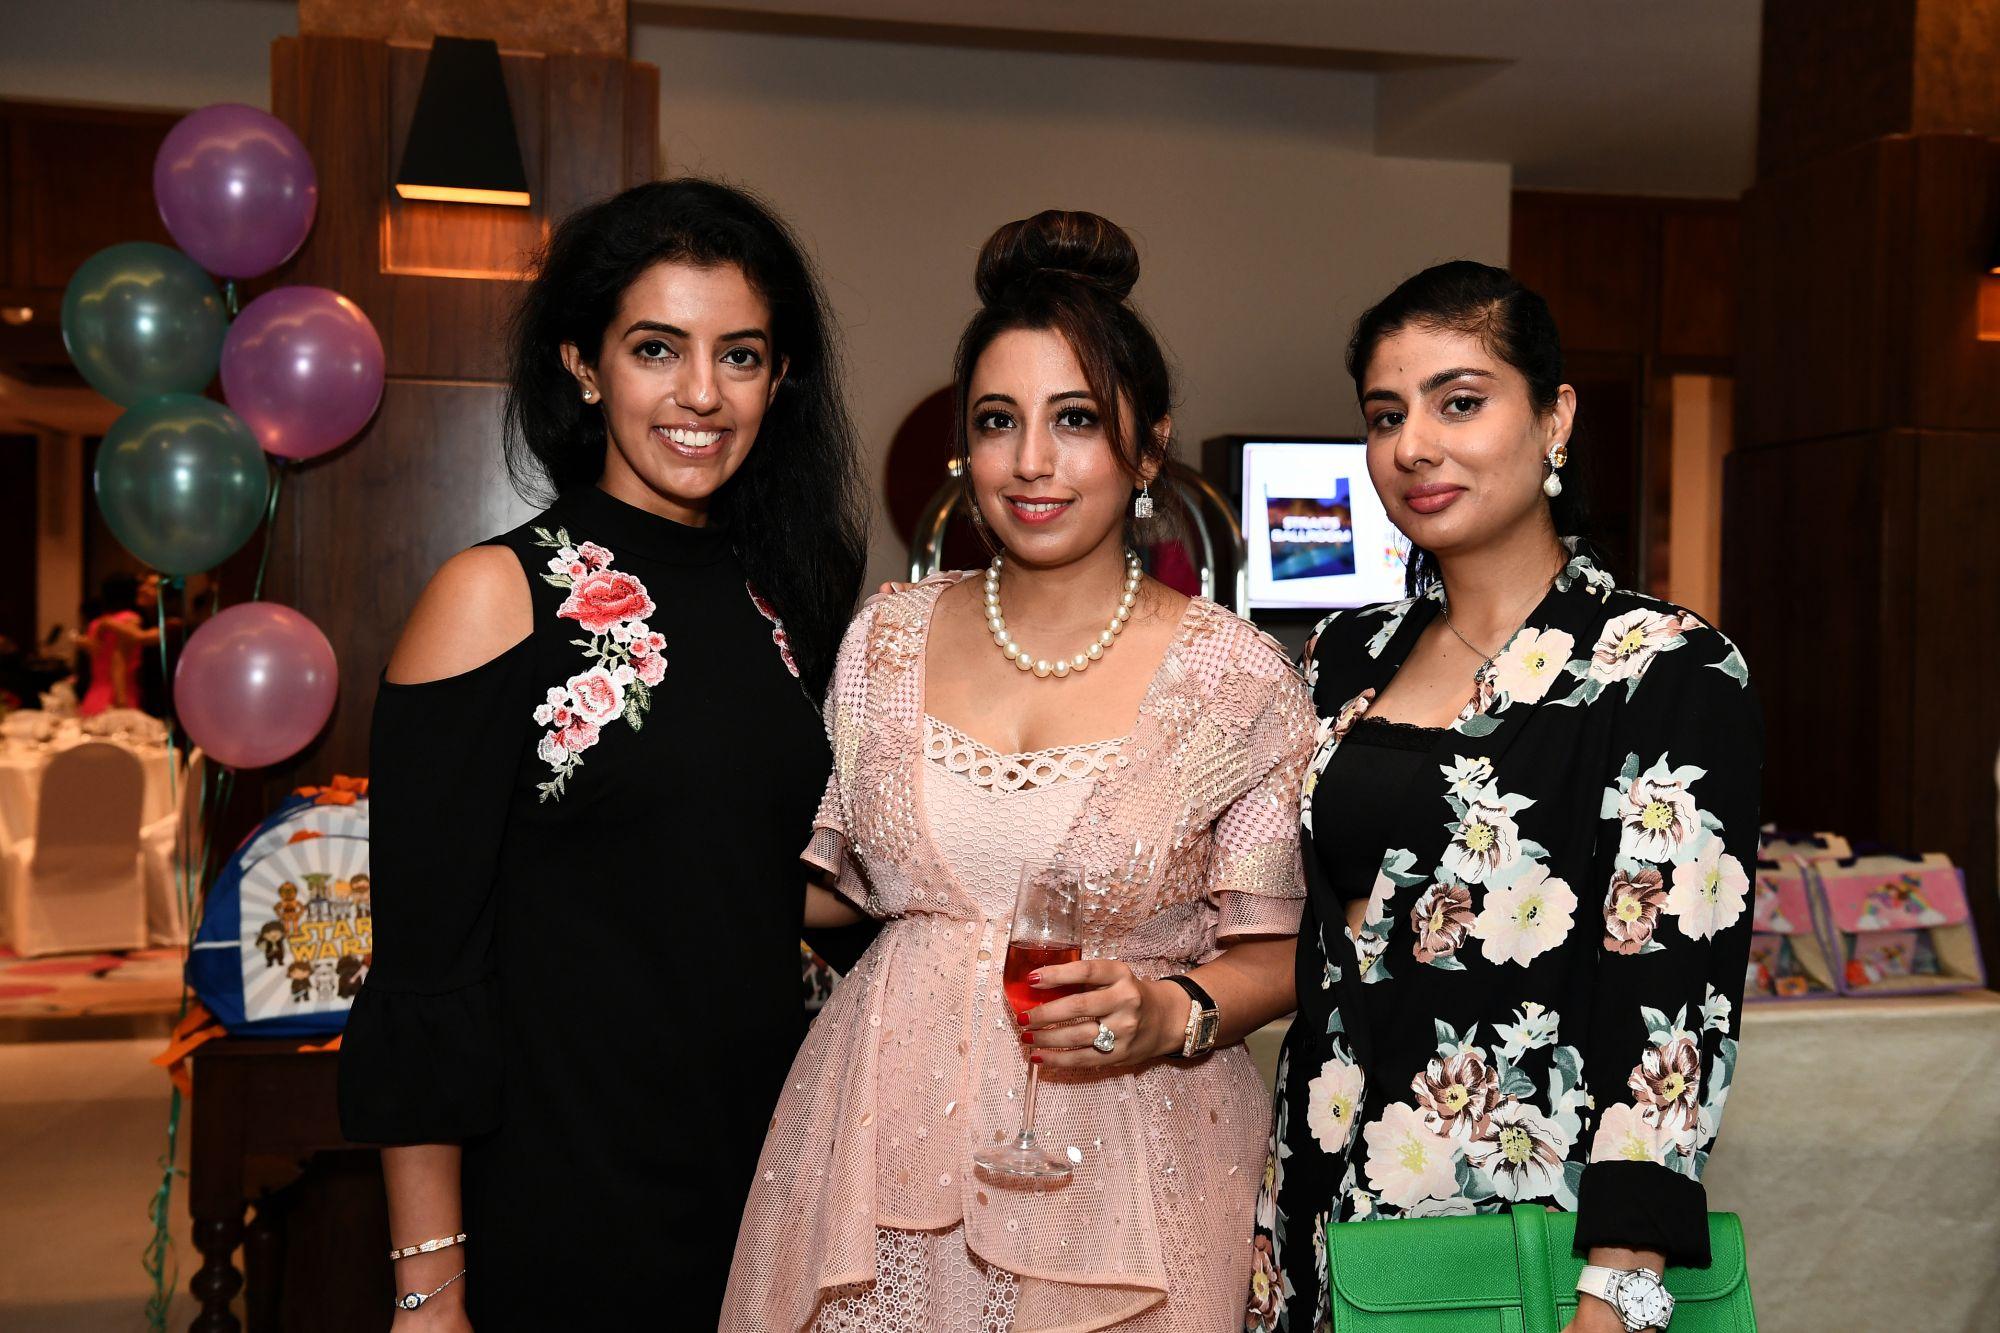 Michelle Buxani, Dimple Aswani, Nayantara Dhillon